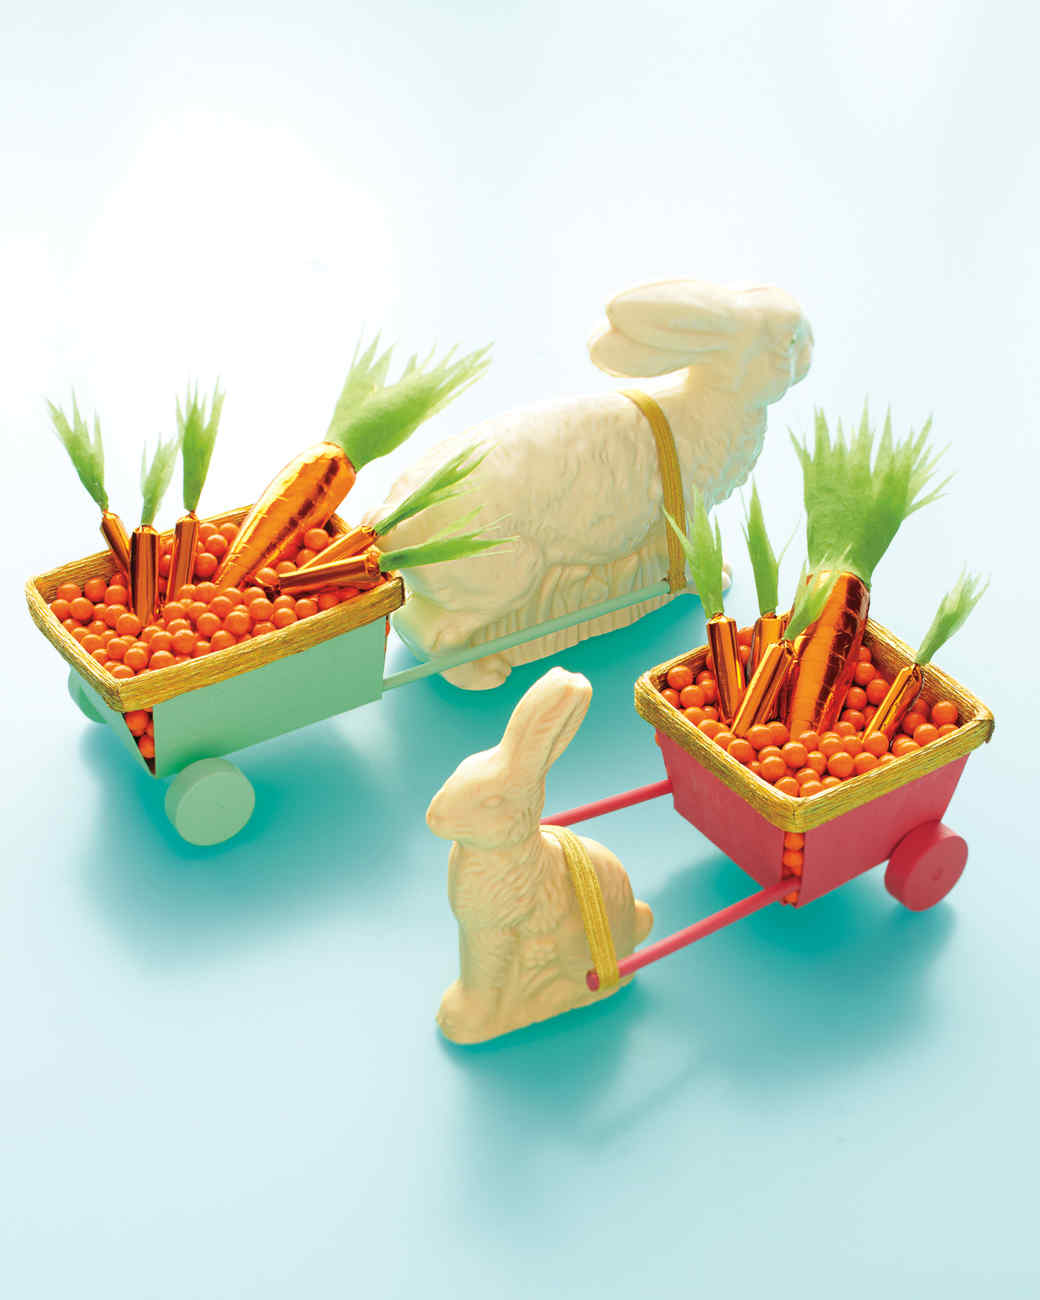 easter-baskets-wagons-mld108275.jpg